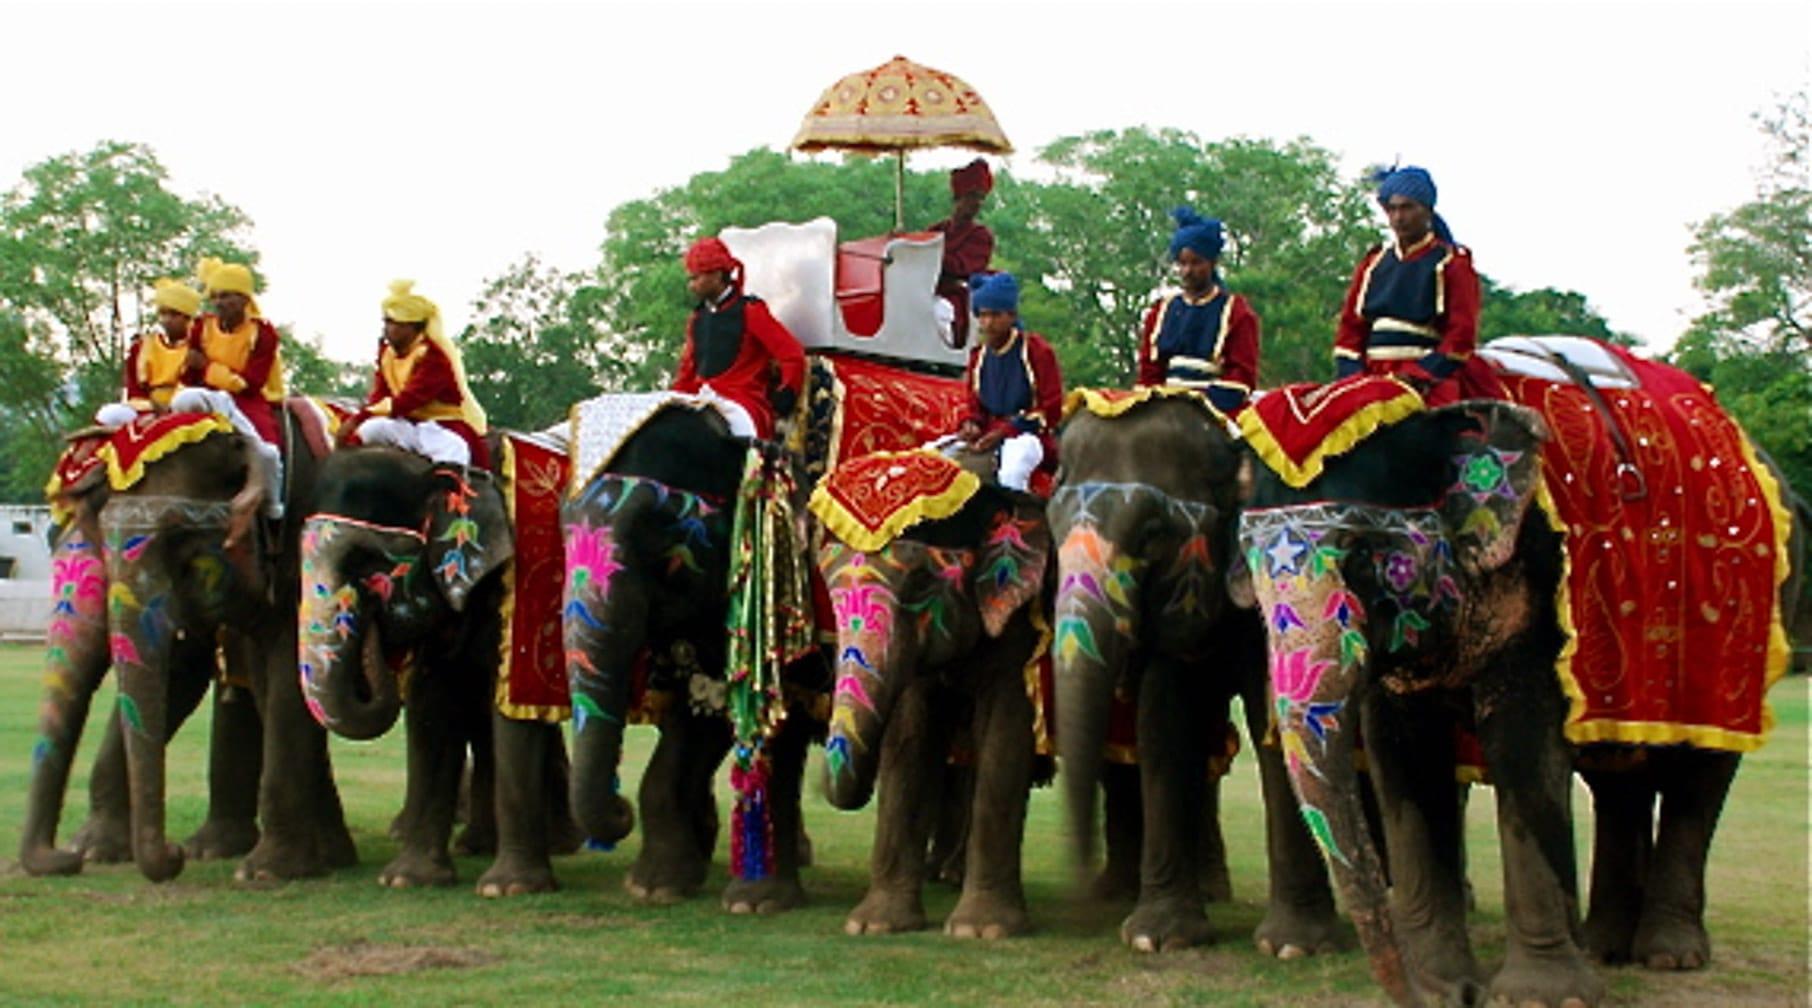 Riding elephants on the Maharajas' Express Indian Splendor, Delhi-Mumbai journey